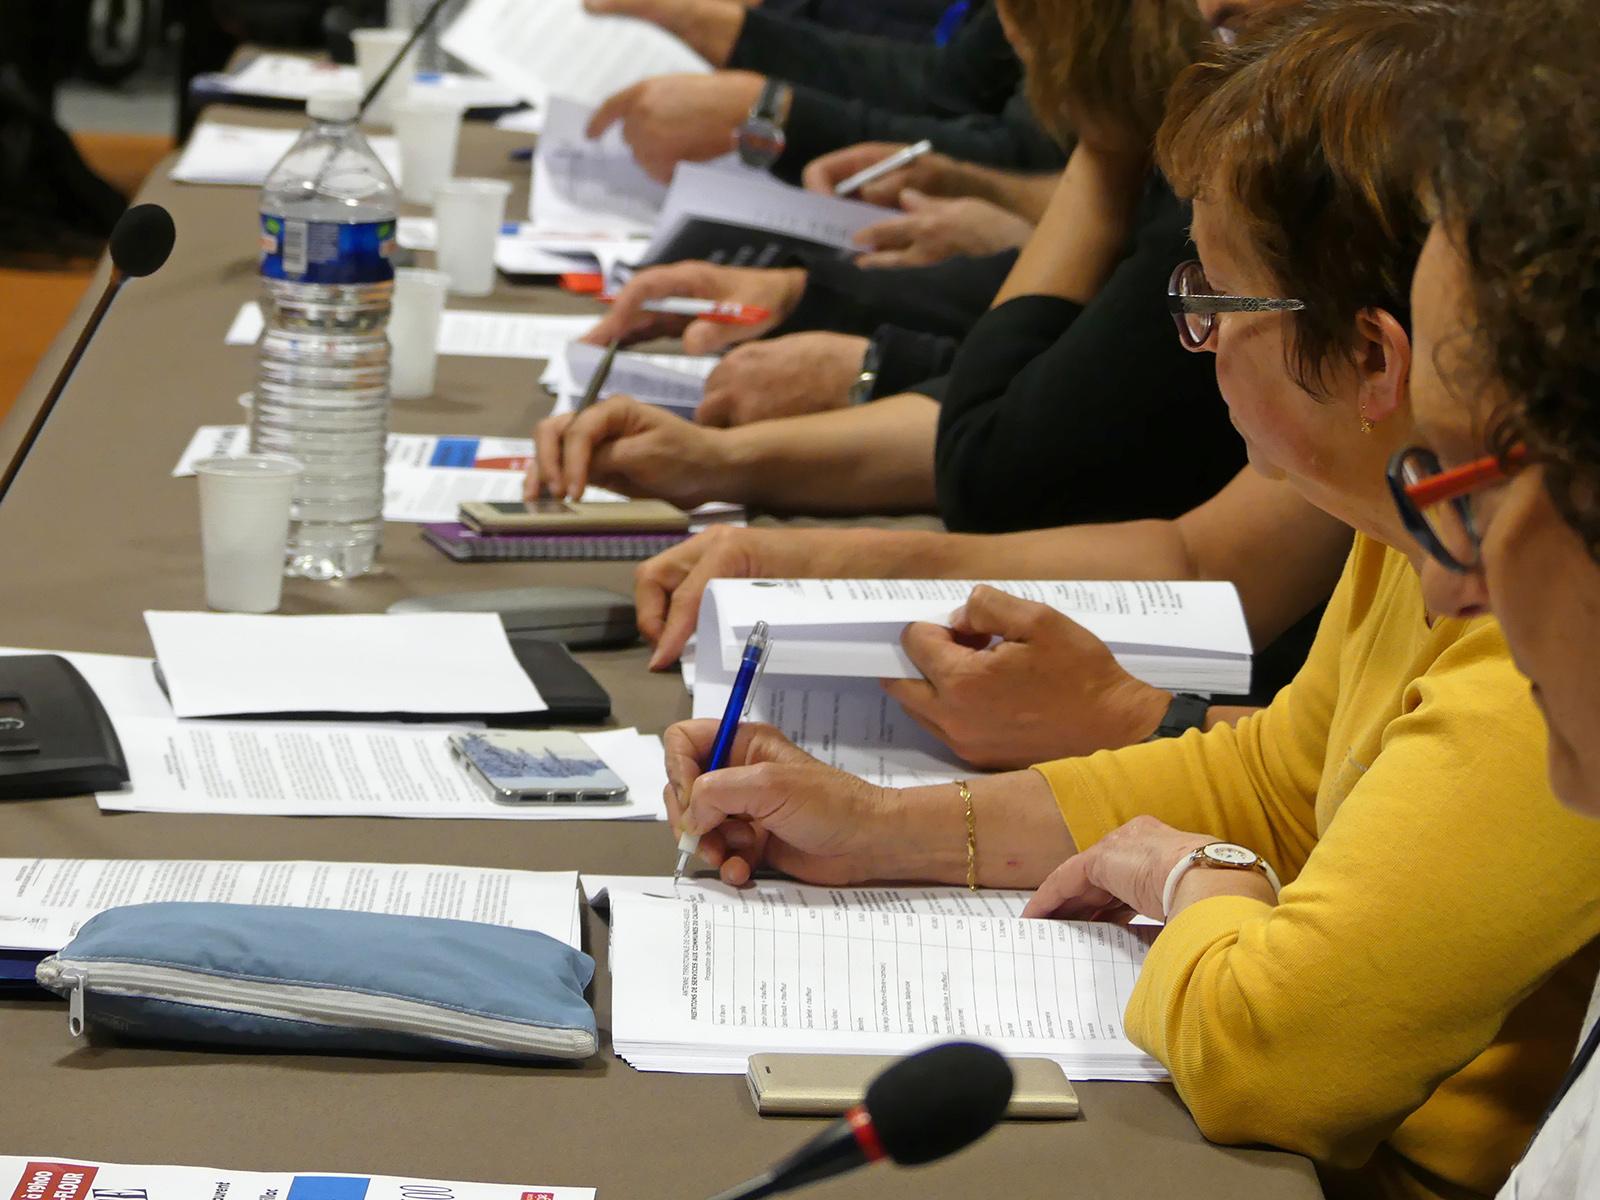 Conseil communautaire panoramique 25 septembre 2017 (2)